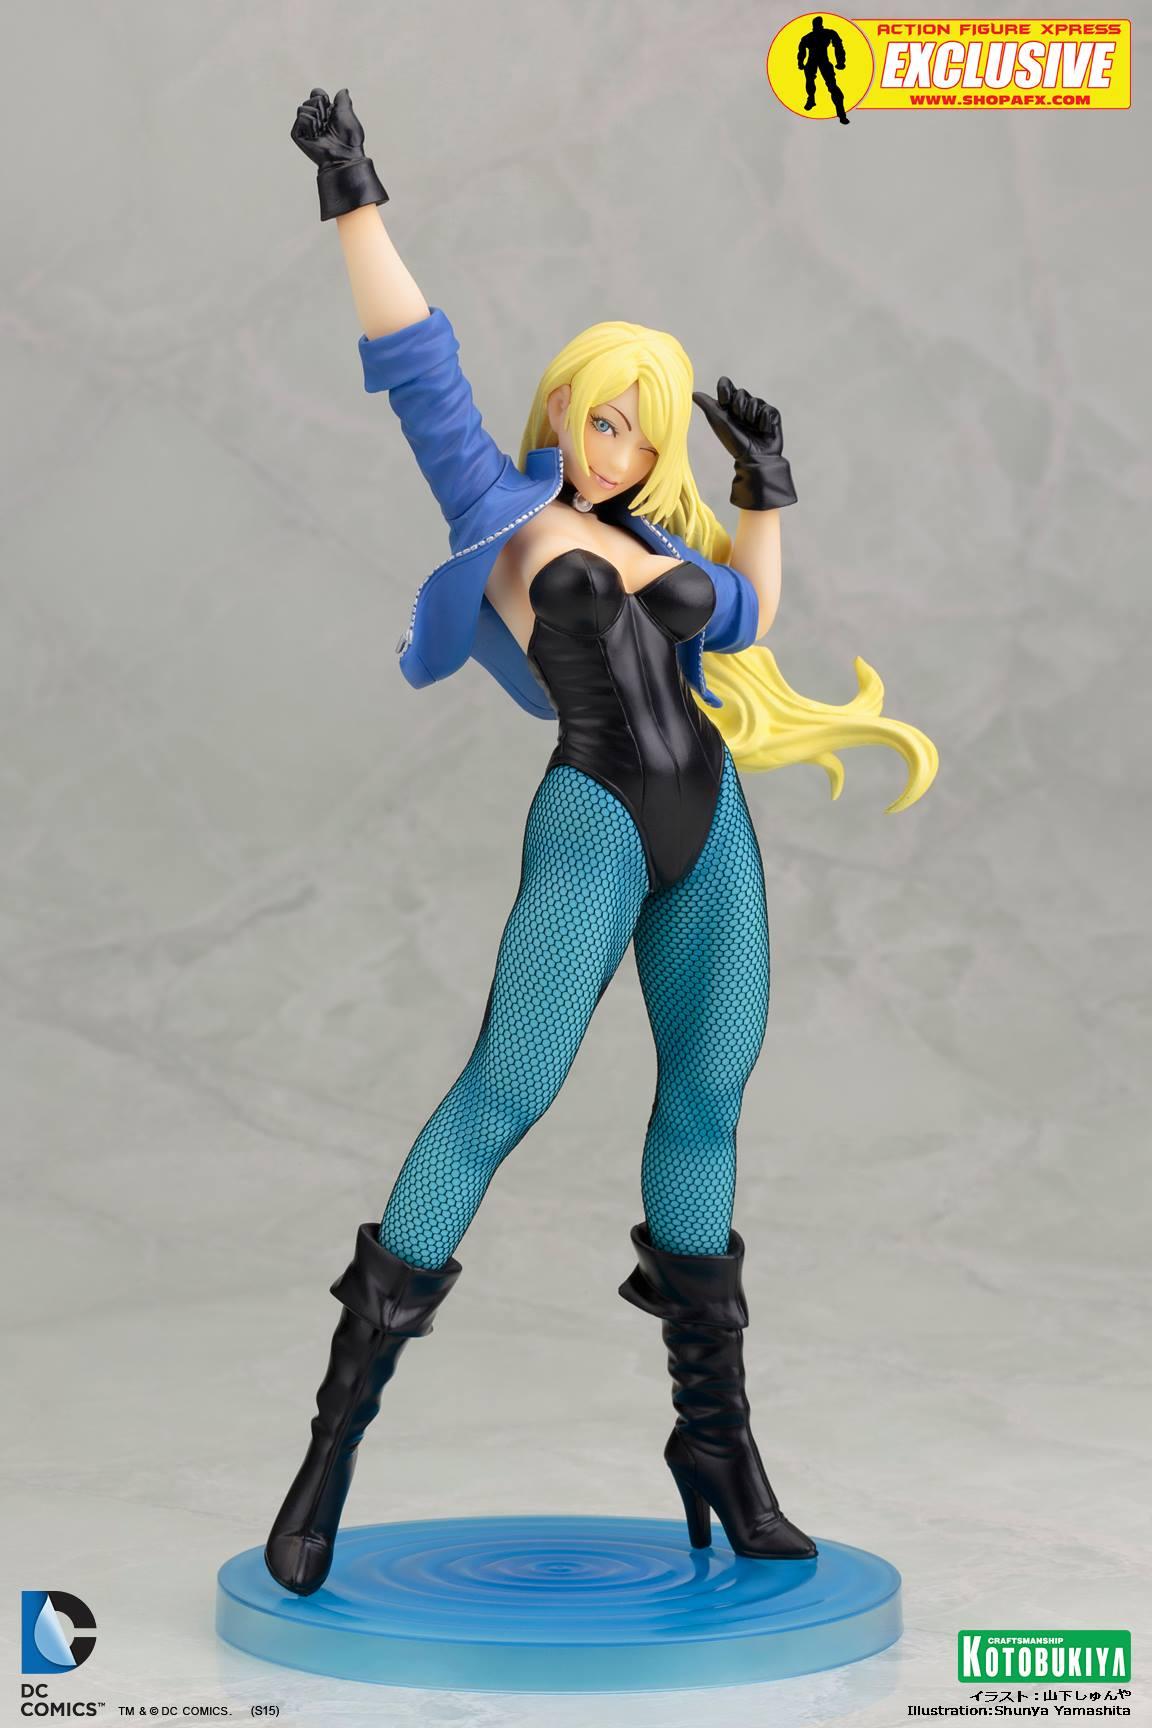 black-canary-classic-costume-bishoujo-statue-exclusive-dc-comics-kotobukiya-1